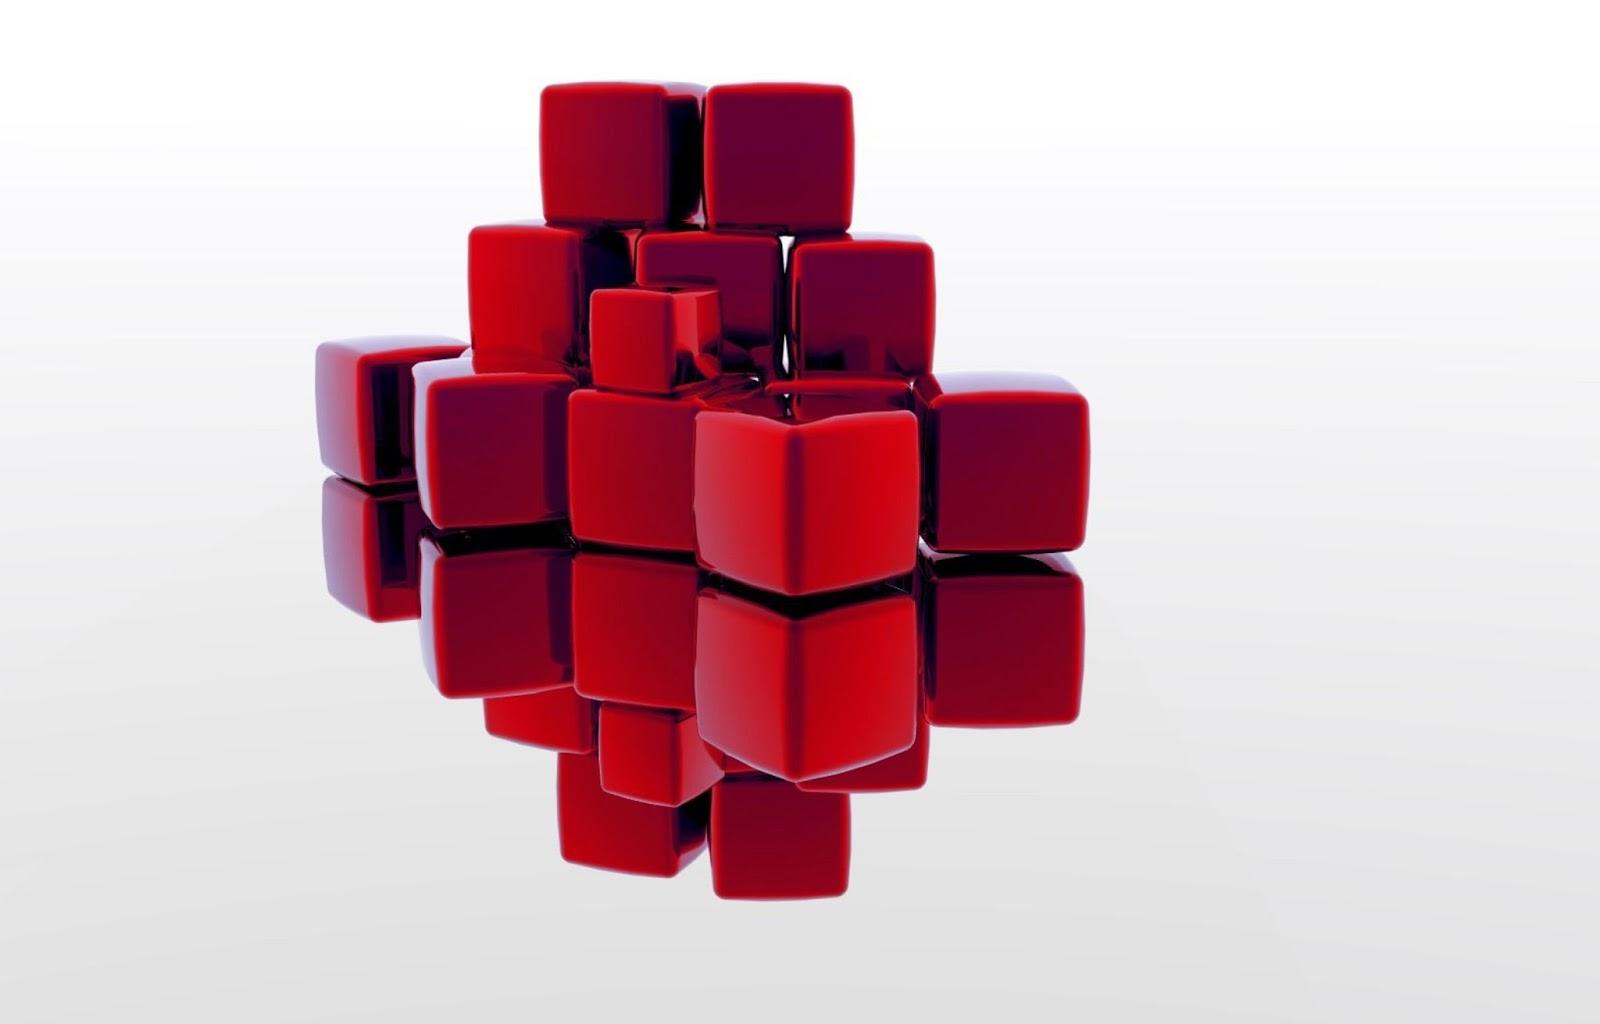 building blocks wallpaper hd: HD Wallpapers (High Definition